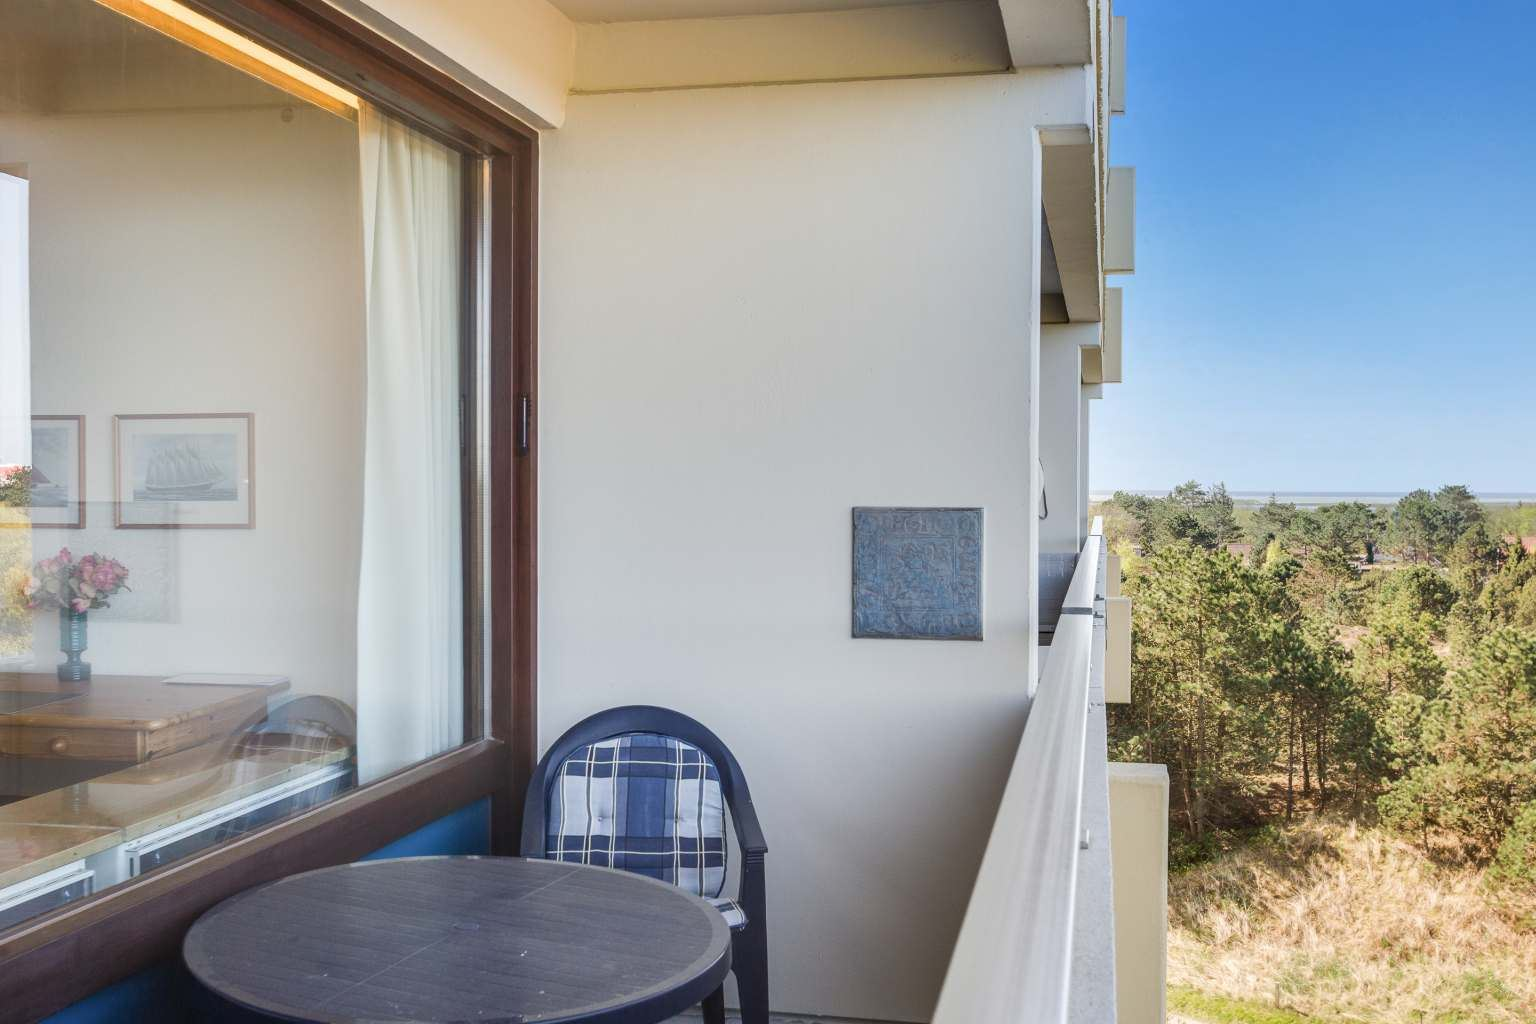 Balkon, Ferienwohnung Nr. 80, St Peter Ording Bad, Haus Atlantic,  Alter Badweg 11-15